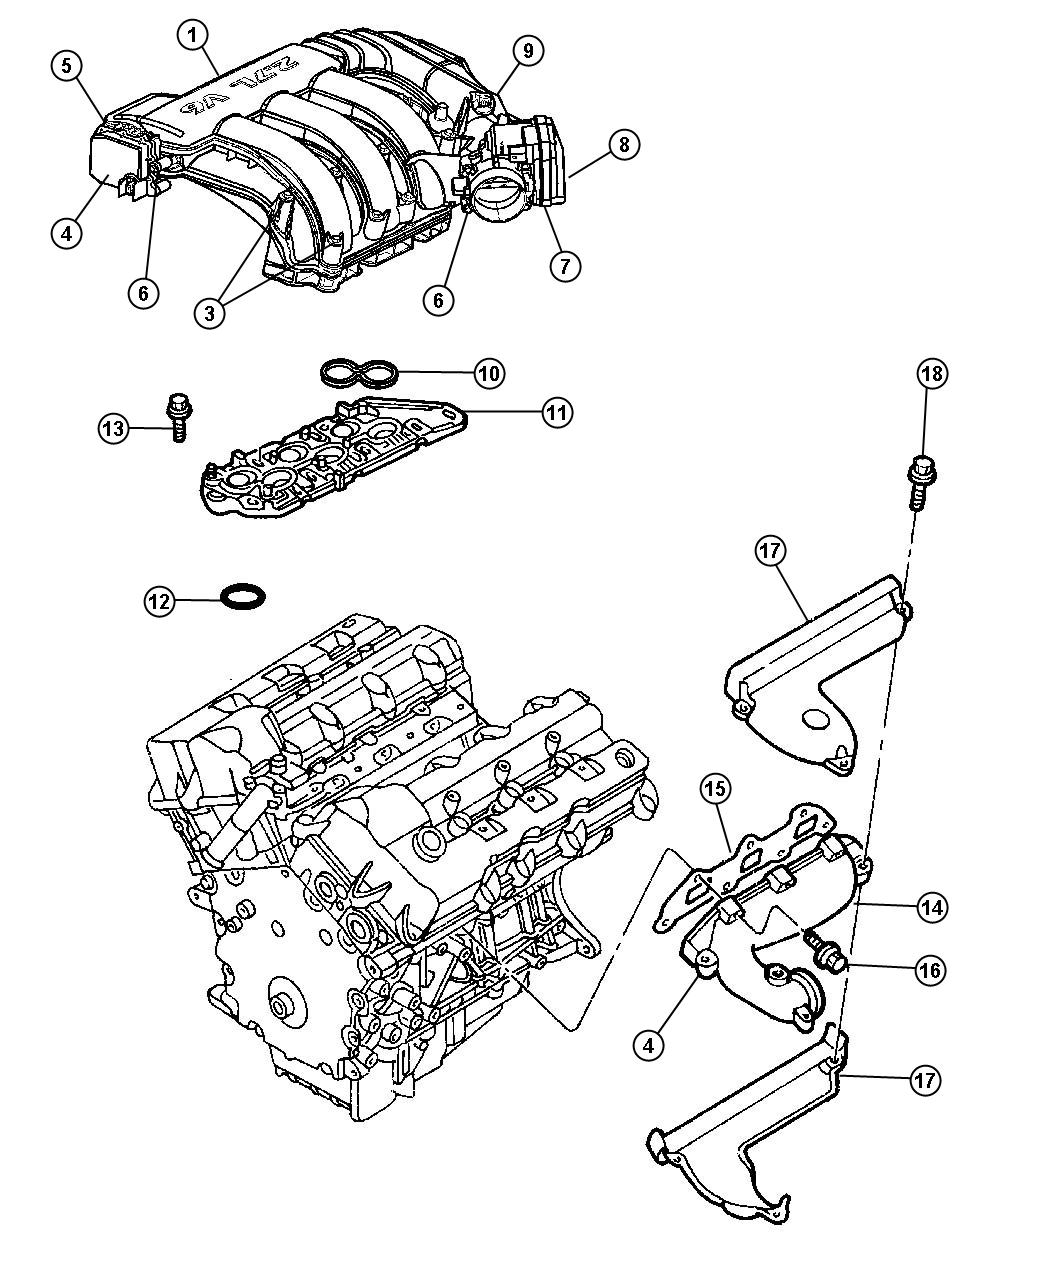 Chrysler 300 2 7 Engine Diagram Knock Sensor - Stereo Wiring Diagram List  Mega Schematicbig-data-1.institut-triskell-de-diamant.fr